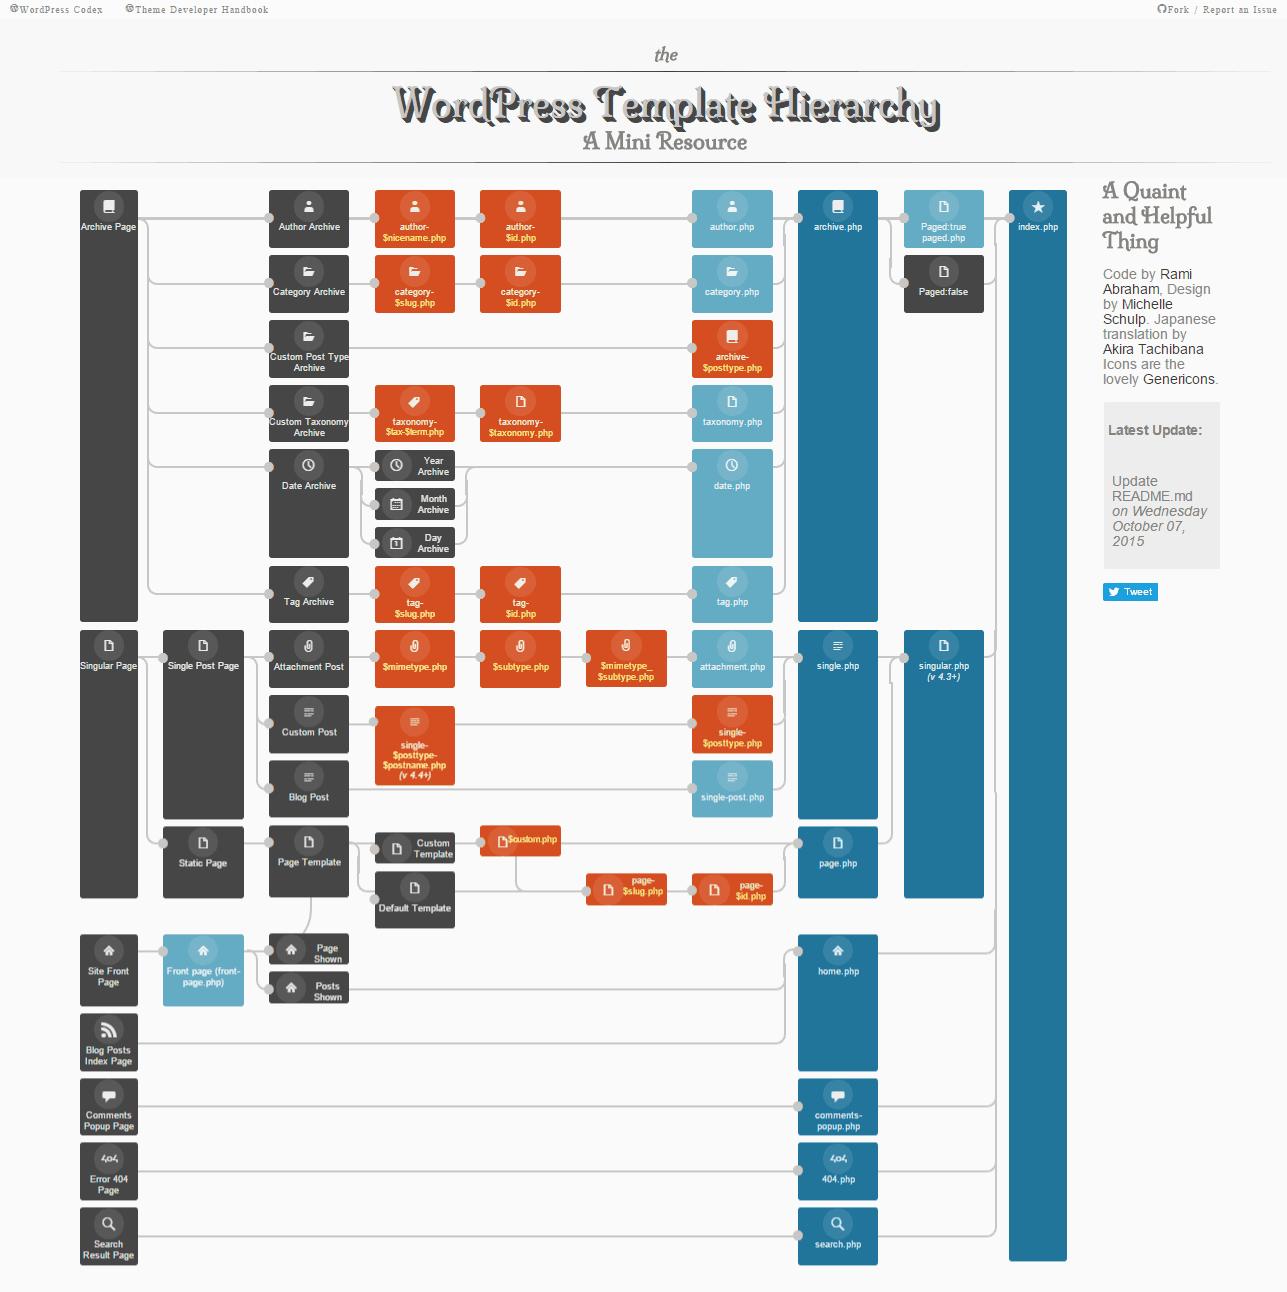 WordPress Template Hierarchy Visualization